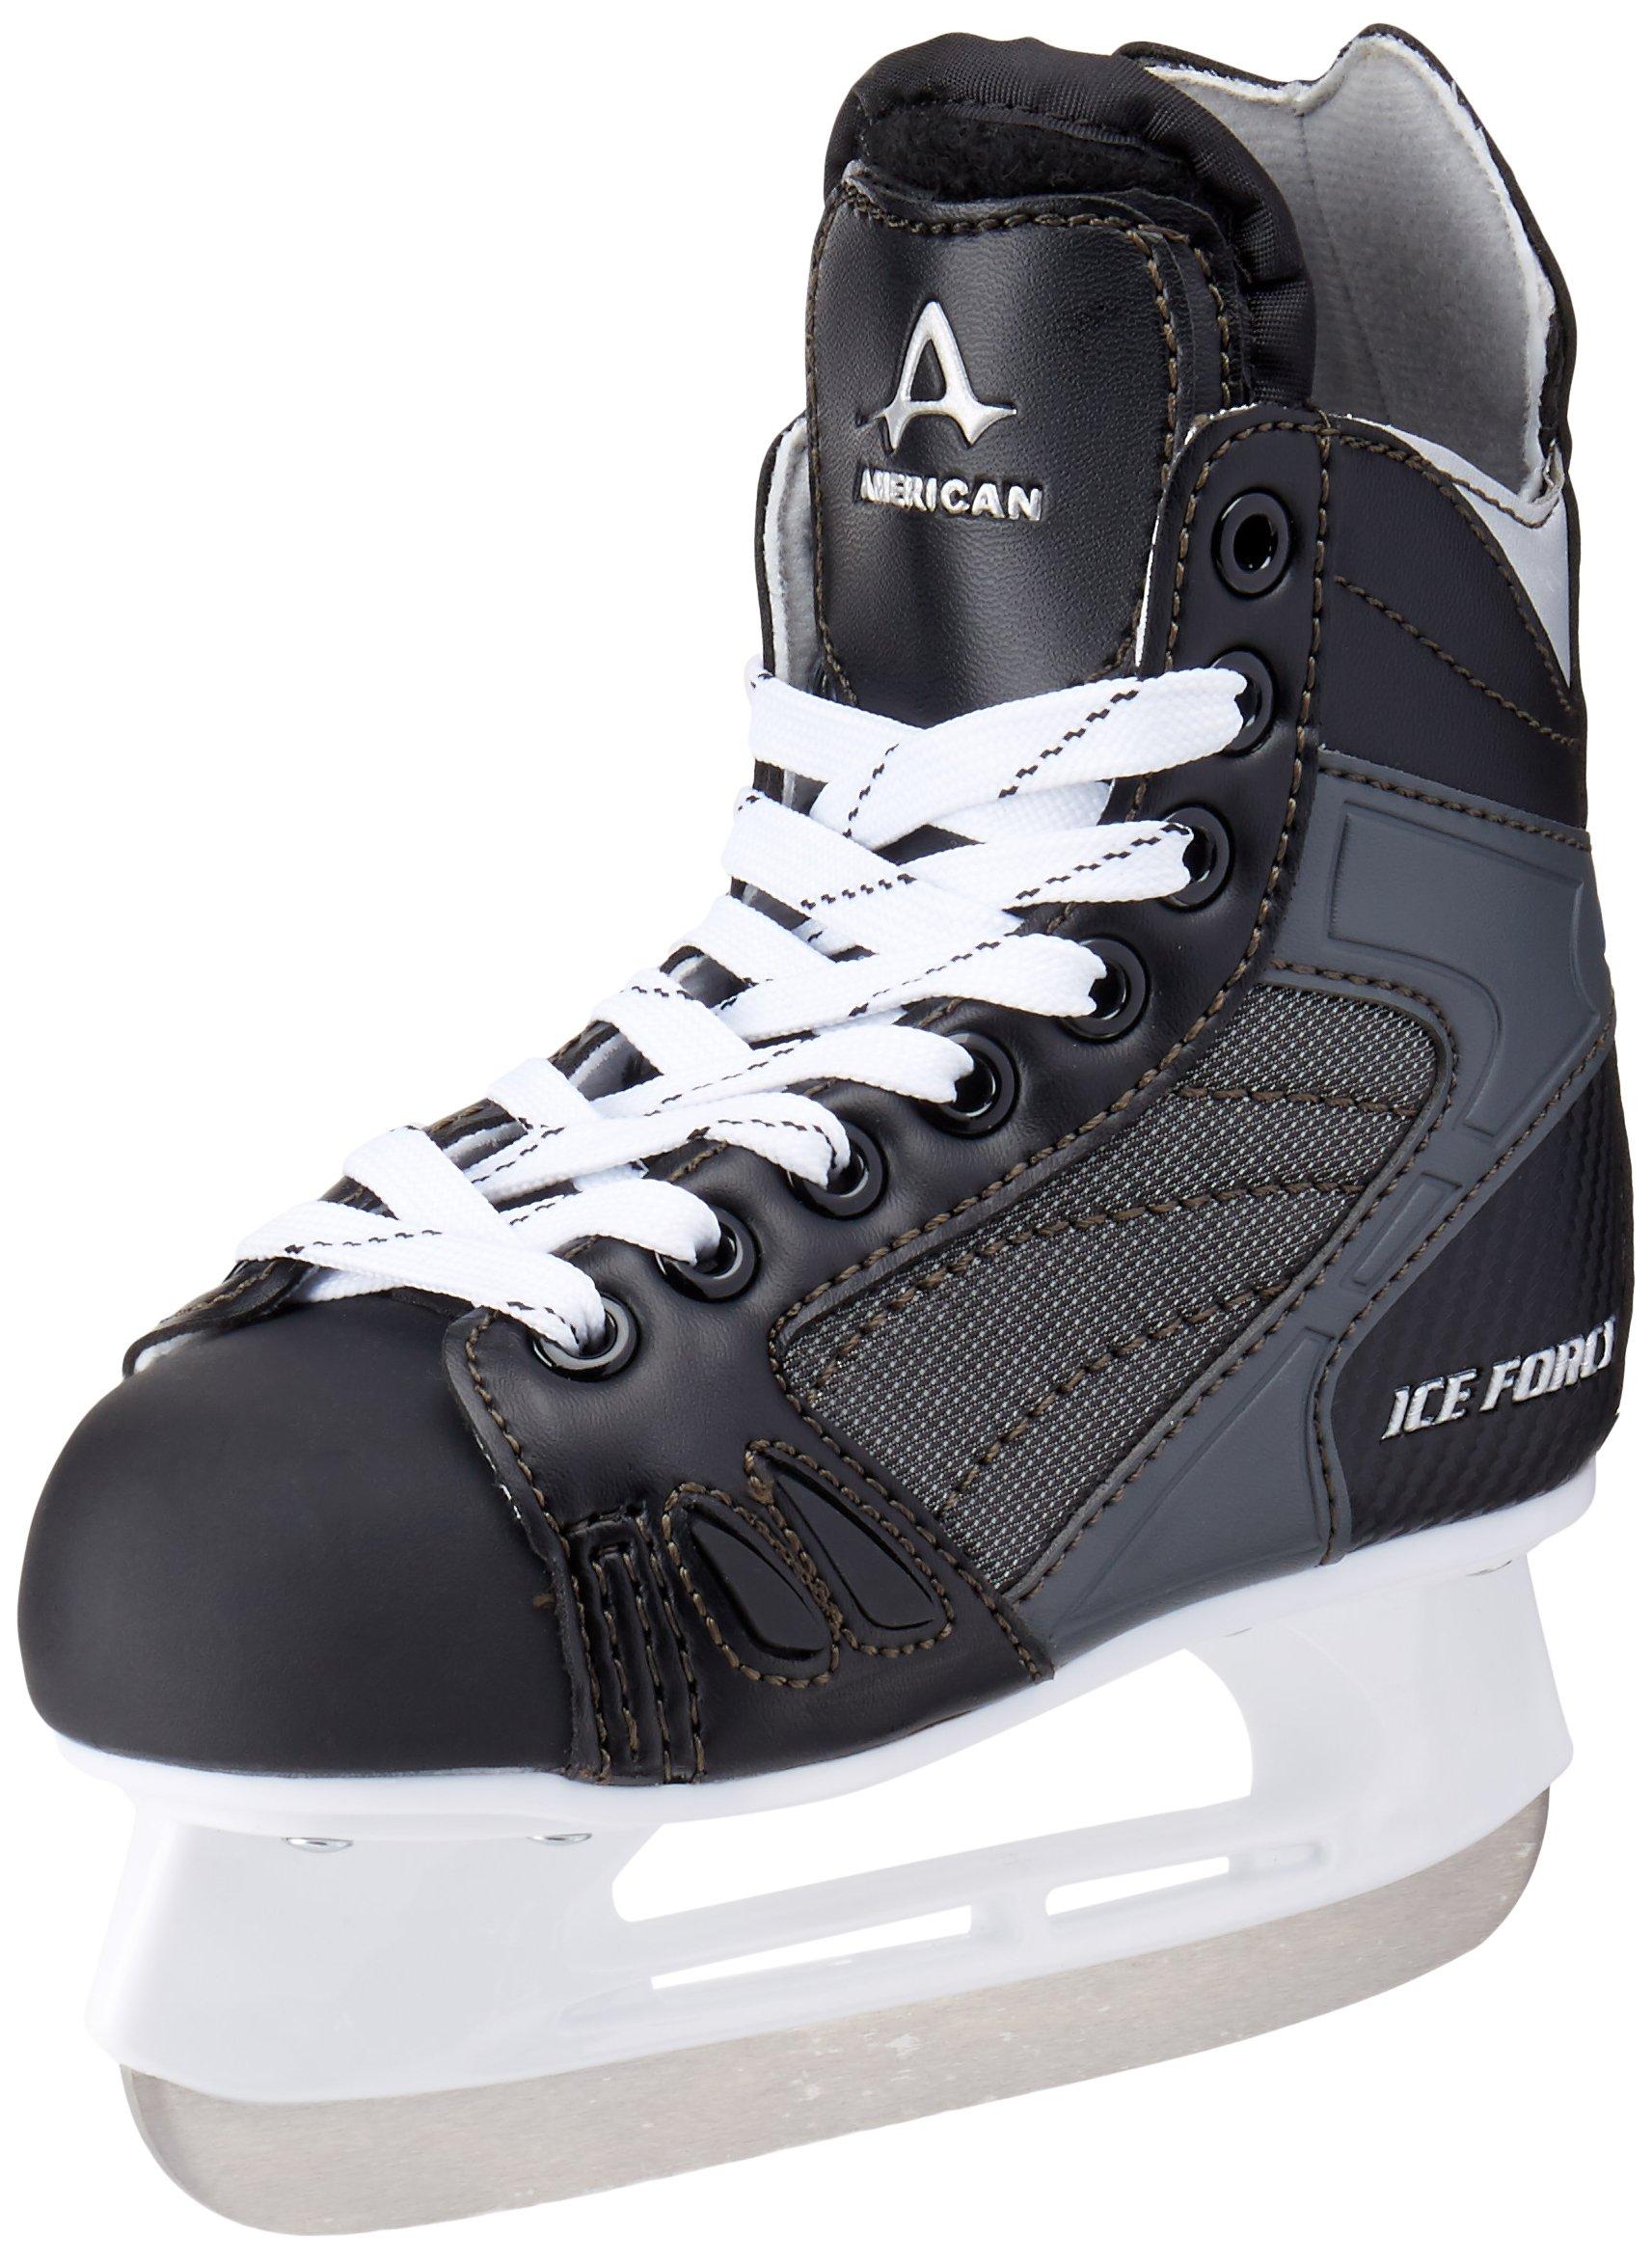 American Athletic Shoe Boy's Ice Force Hockey Skates, Black, 11 Y